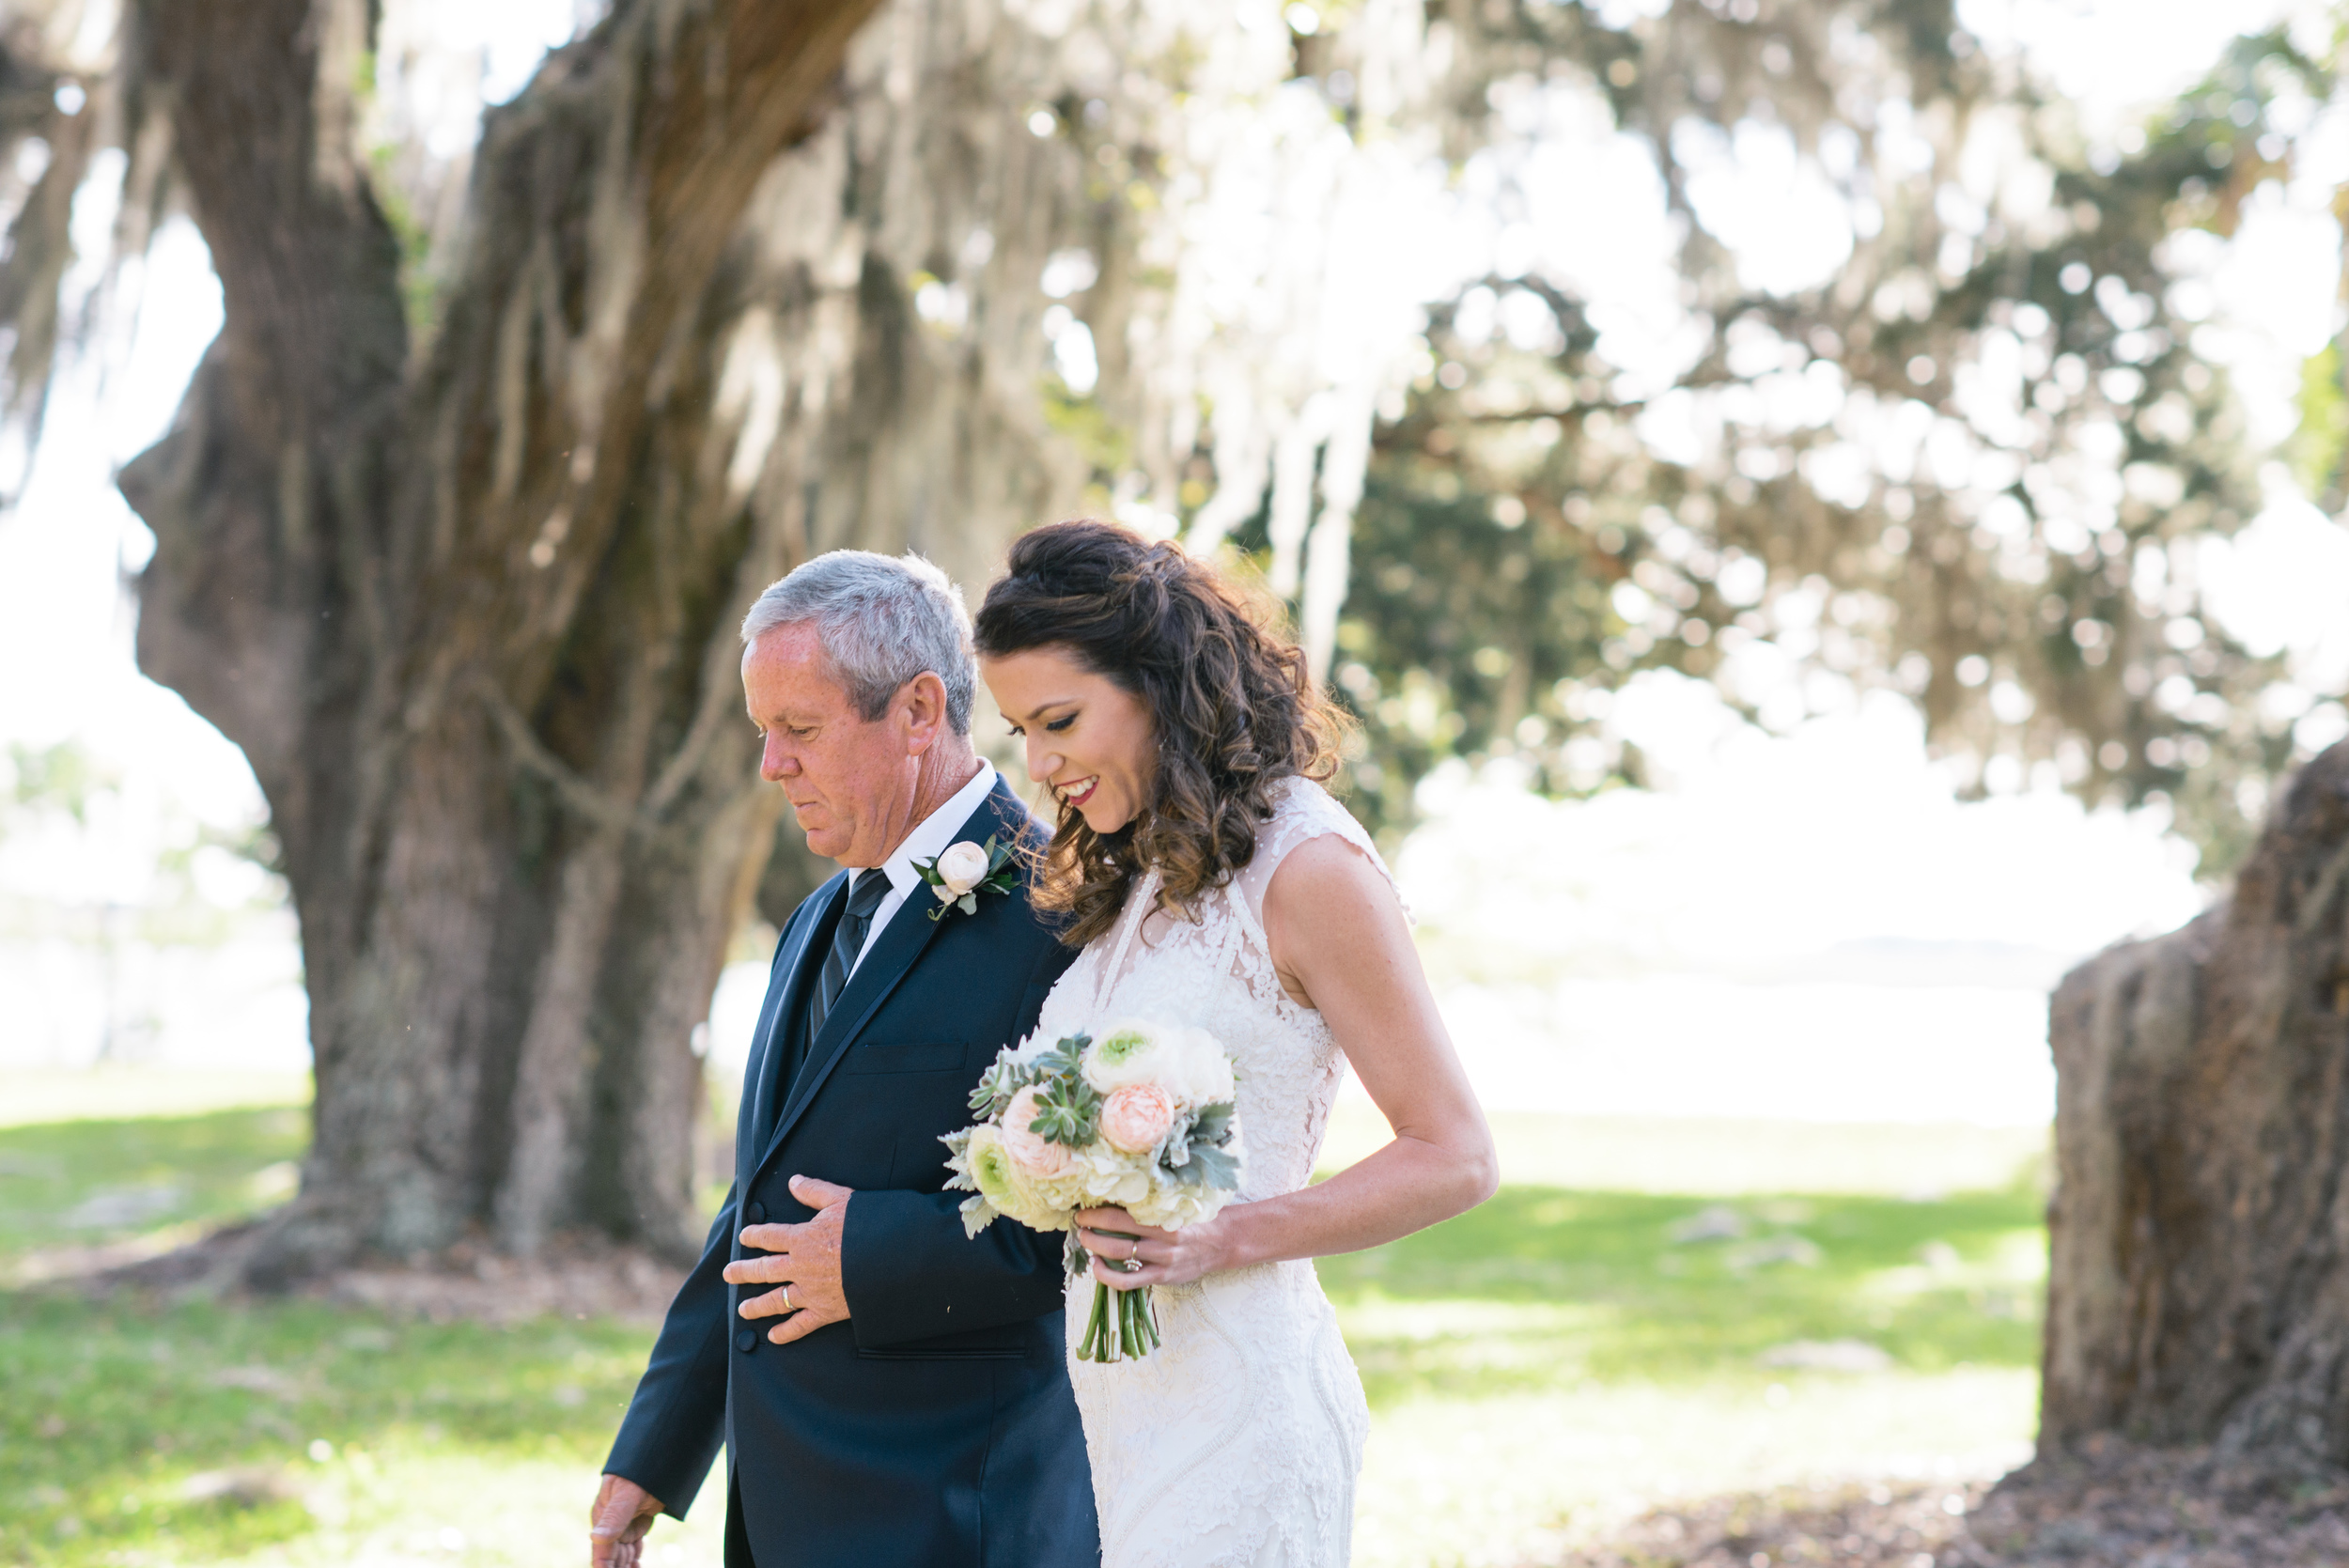 kadi-and-matt-carroll-april-9-2016-jekyl-island-wedding-m-newsom-photography- (465 of 744).jpg